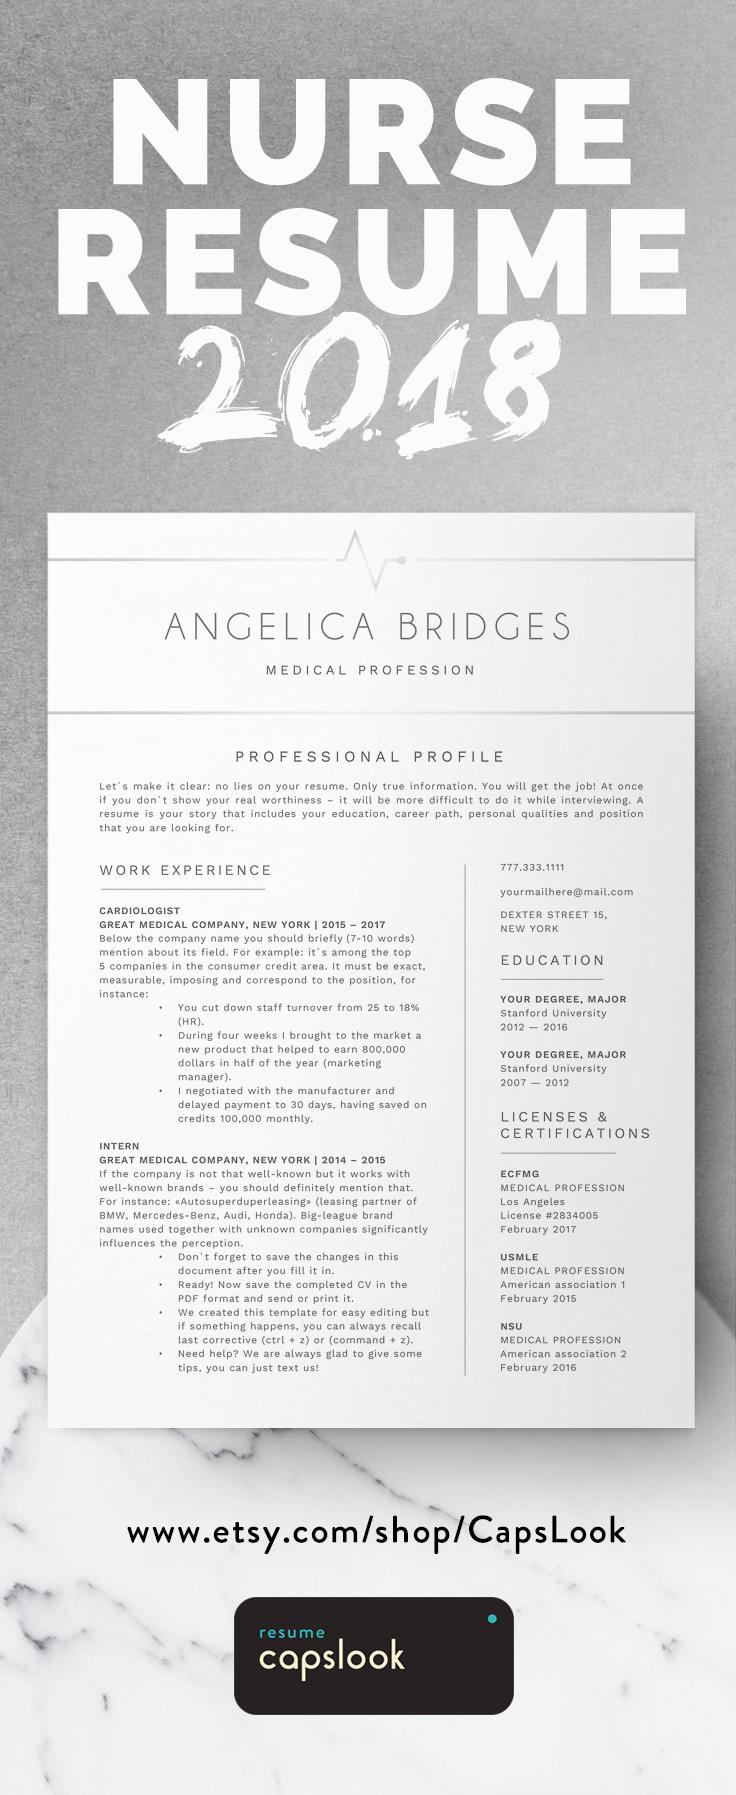 Registered nurse resume, nursing cv template for word